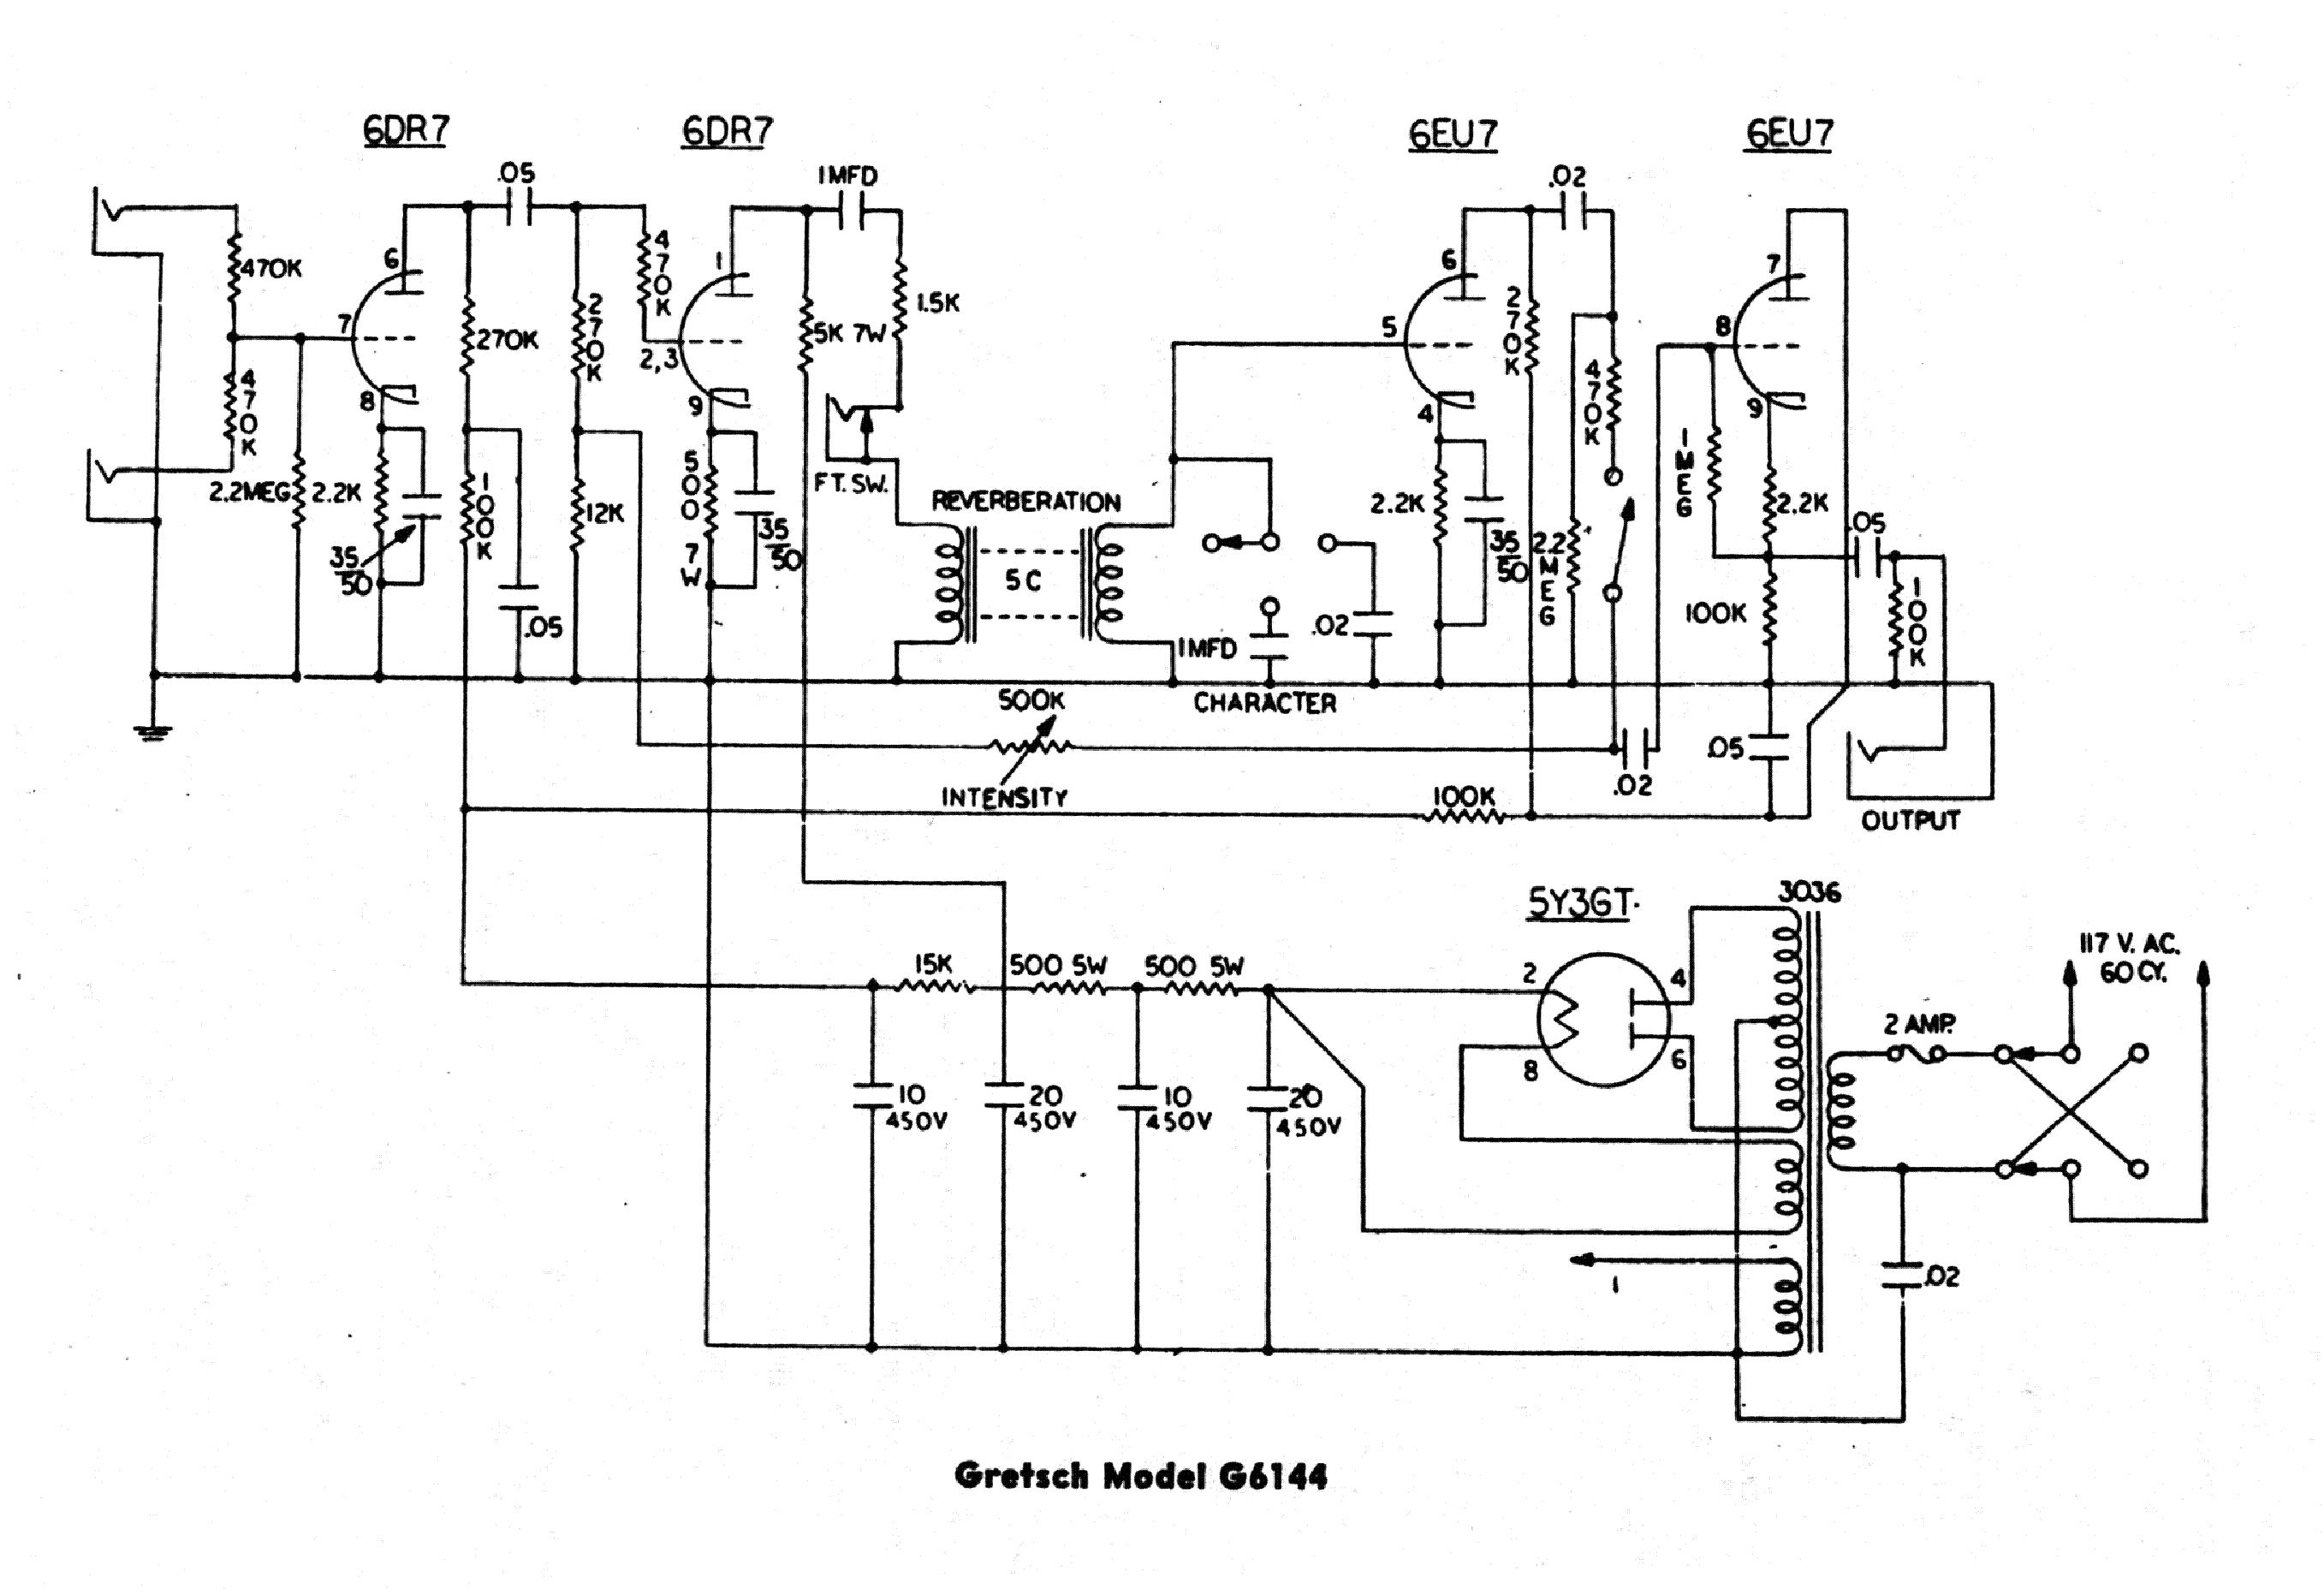 gretsch_g6144_sch.pdf_1 gretsch 6160 service manual download, schematics, eeprom, repair Gretsch Country Gentleman Wiring at reclaimingppi.co